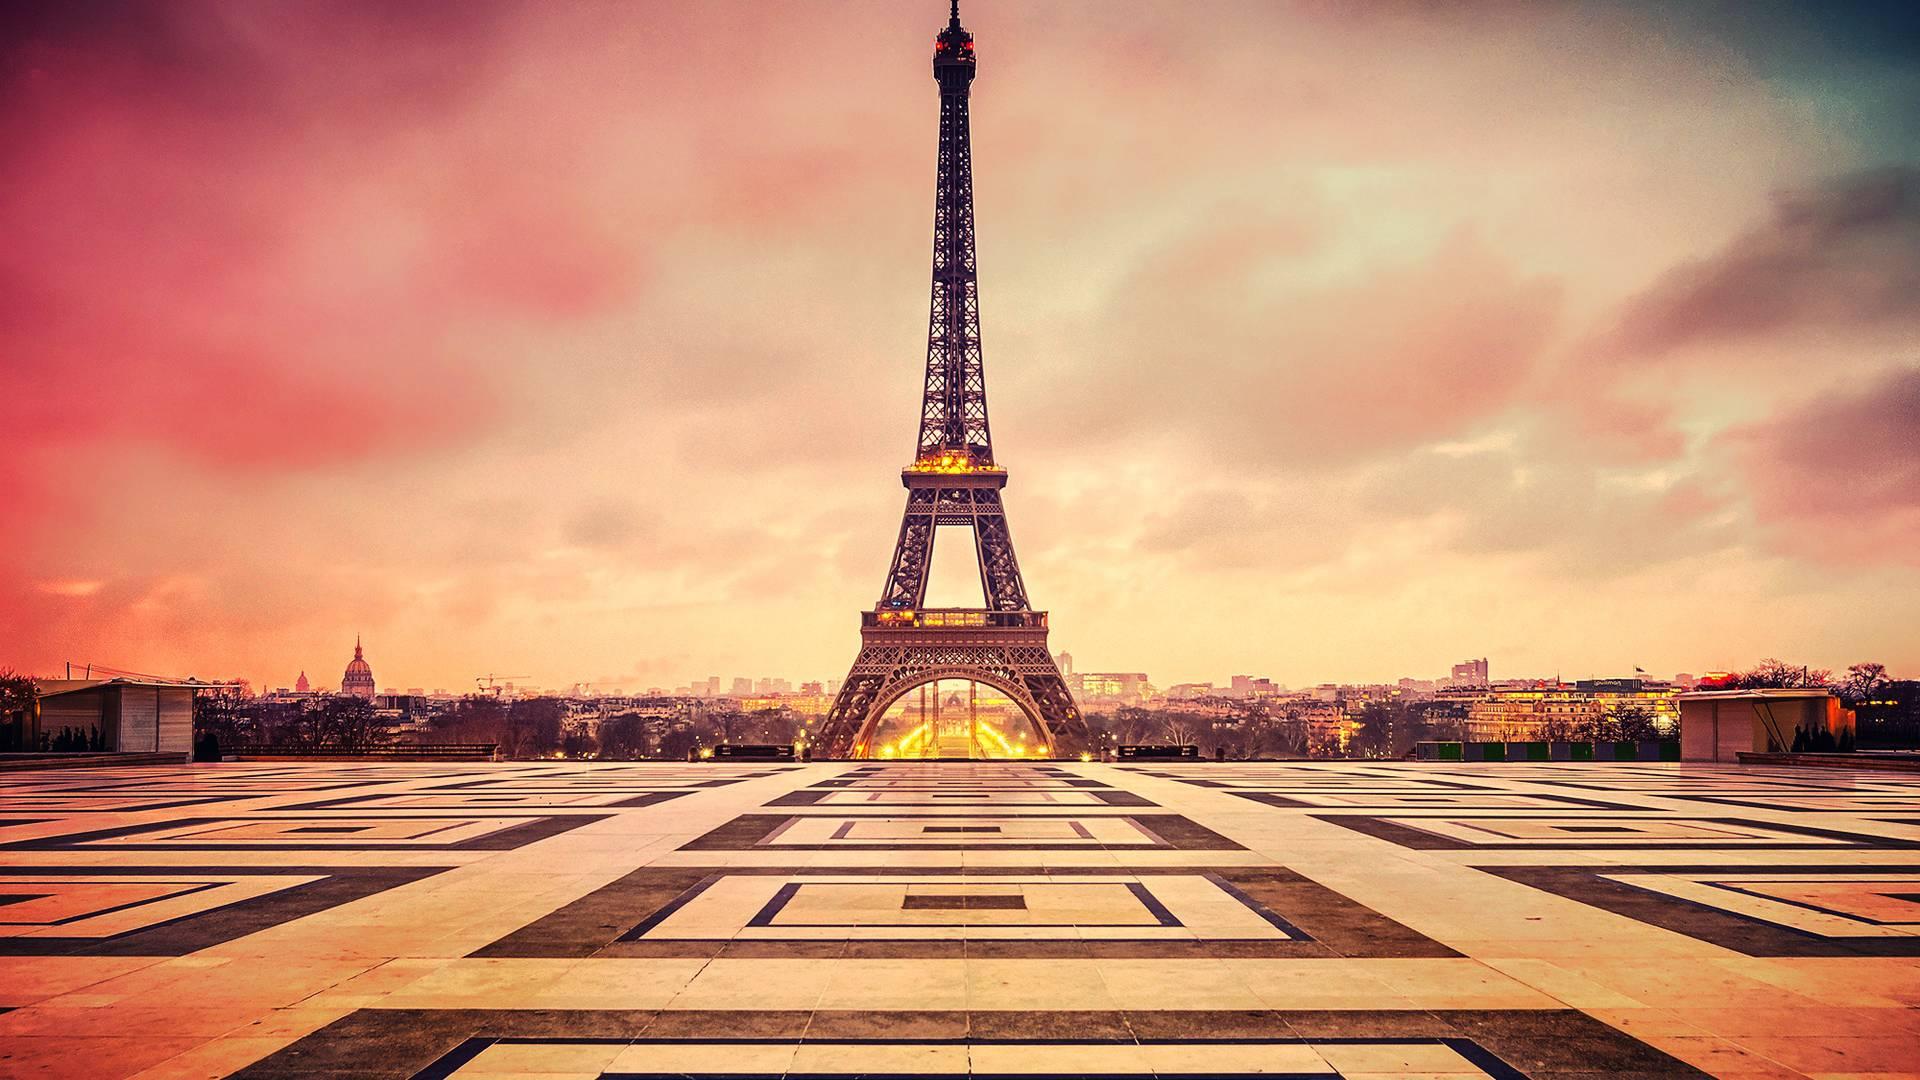 Eiffel-Tower-Beautiful-Paris-Wallpaper-HD